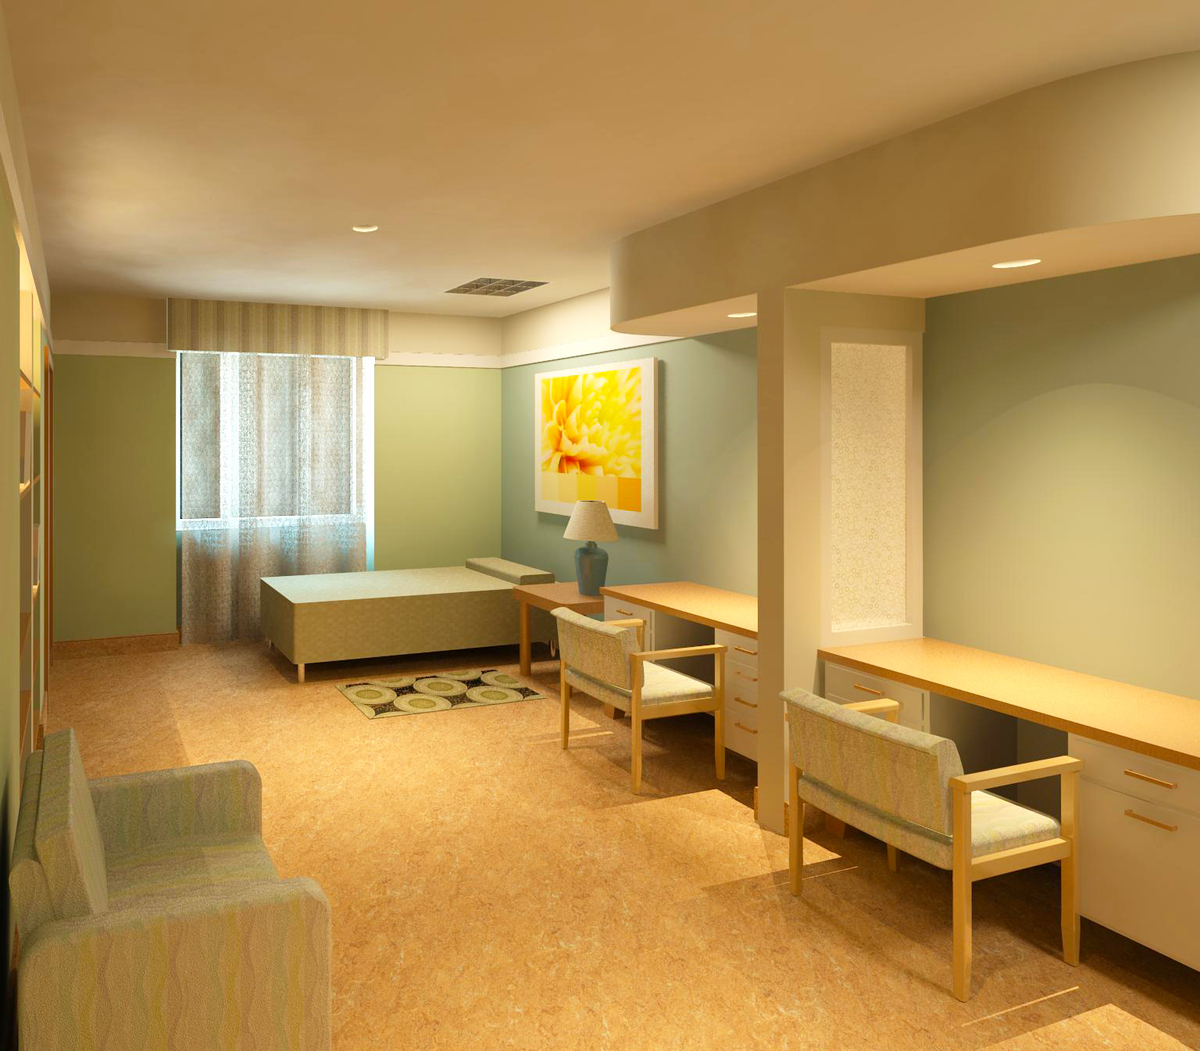 Hospital Renovation Veteran Affairs Augusta Ga Ana Paula Winterrowd Archinect